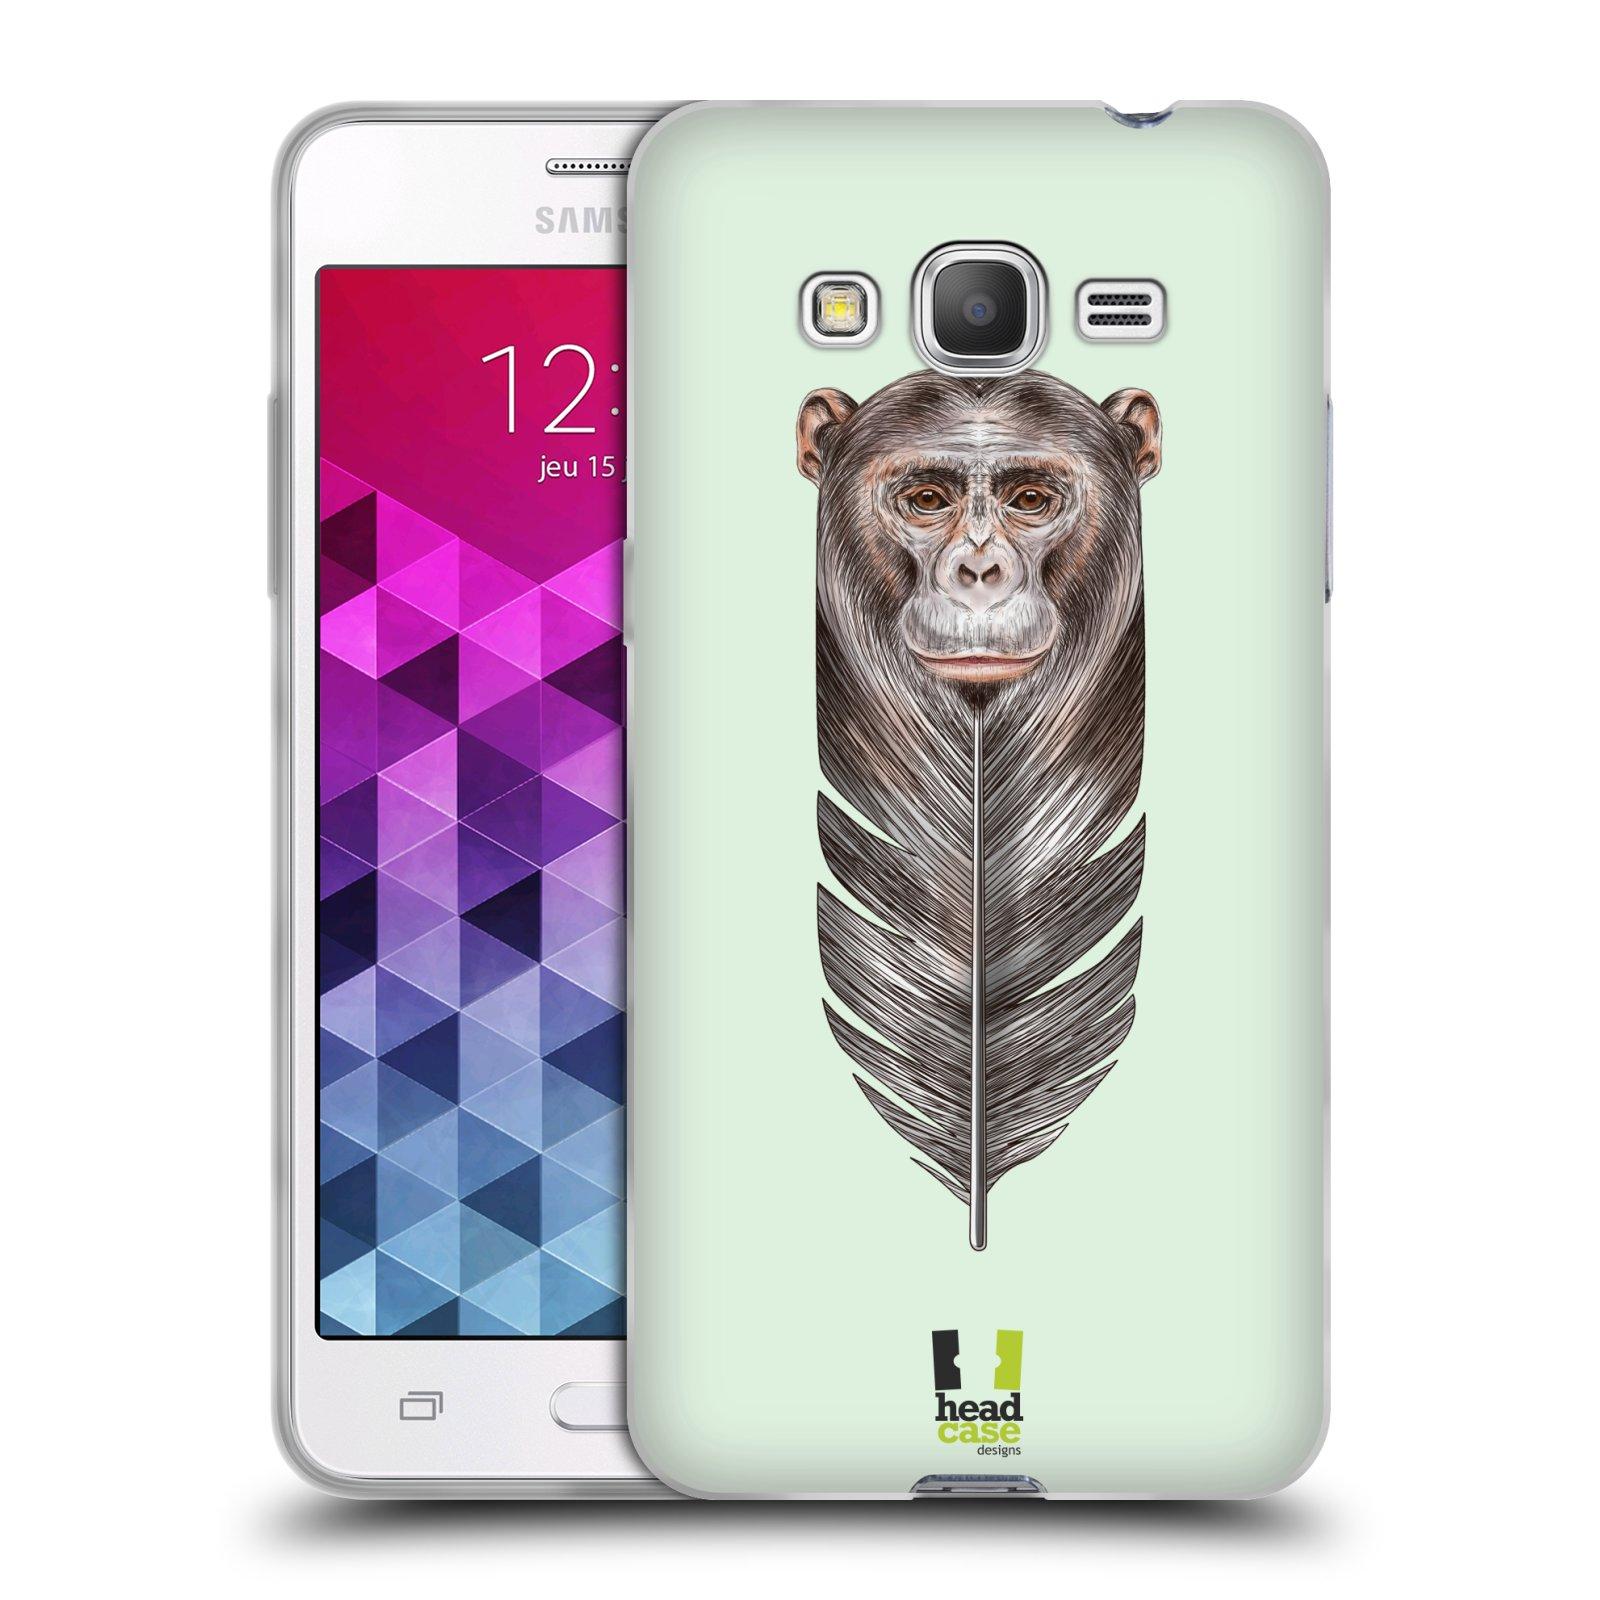 Silikonové pouzdro na mobil Samsung Galaxy Grand Prime VE HEAD CASE PÍRKO OPIČKA (Silikonový kryt či obal na mobilní telefon Samsung Galaxy Grand Prime VE SM-G531F)